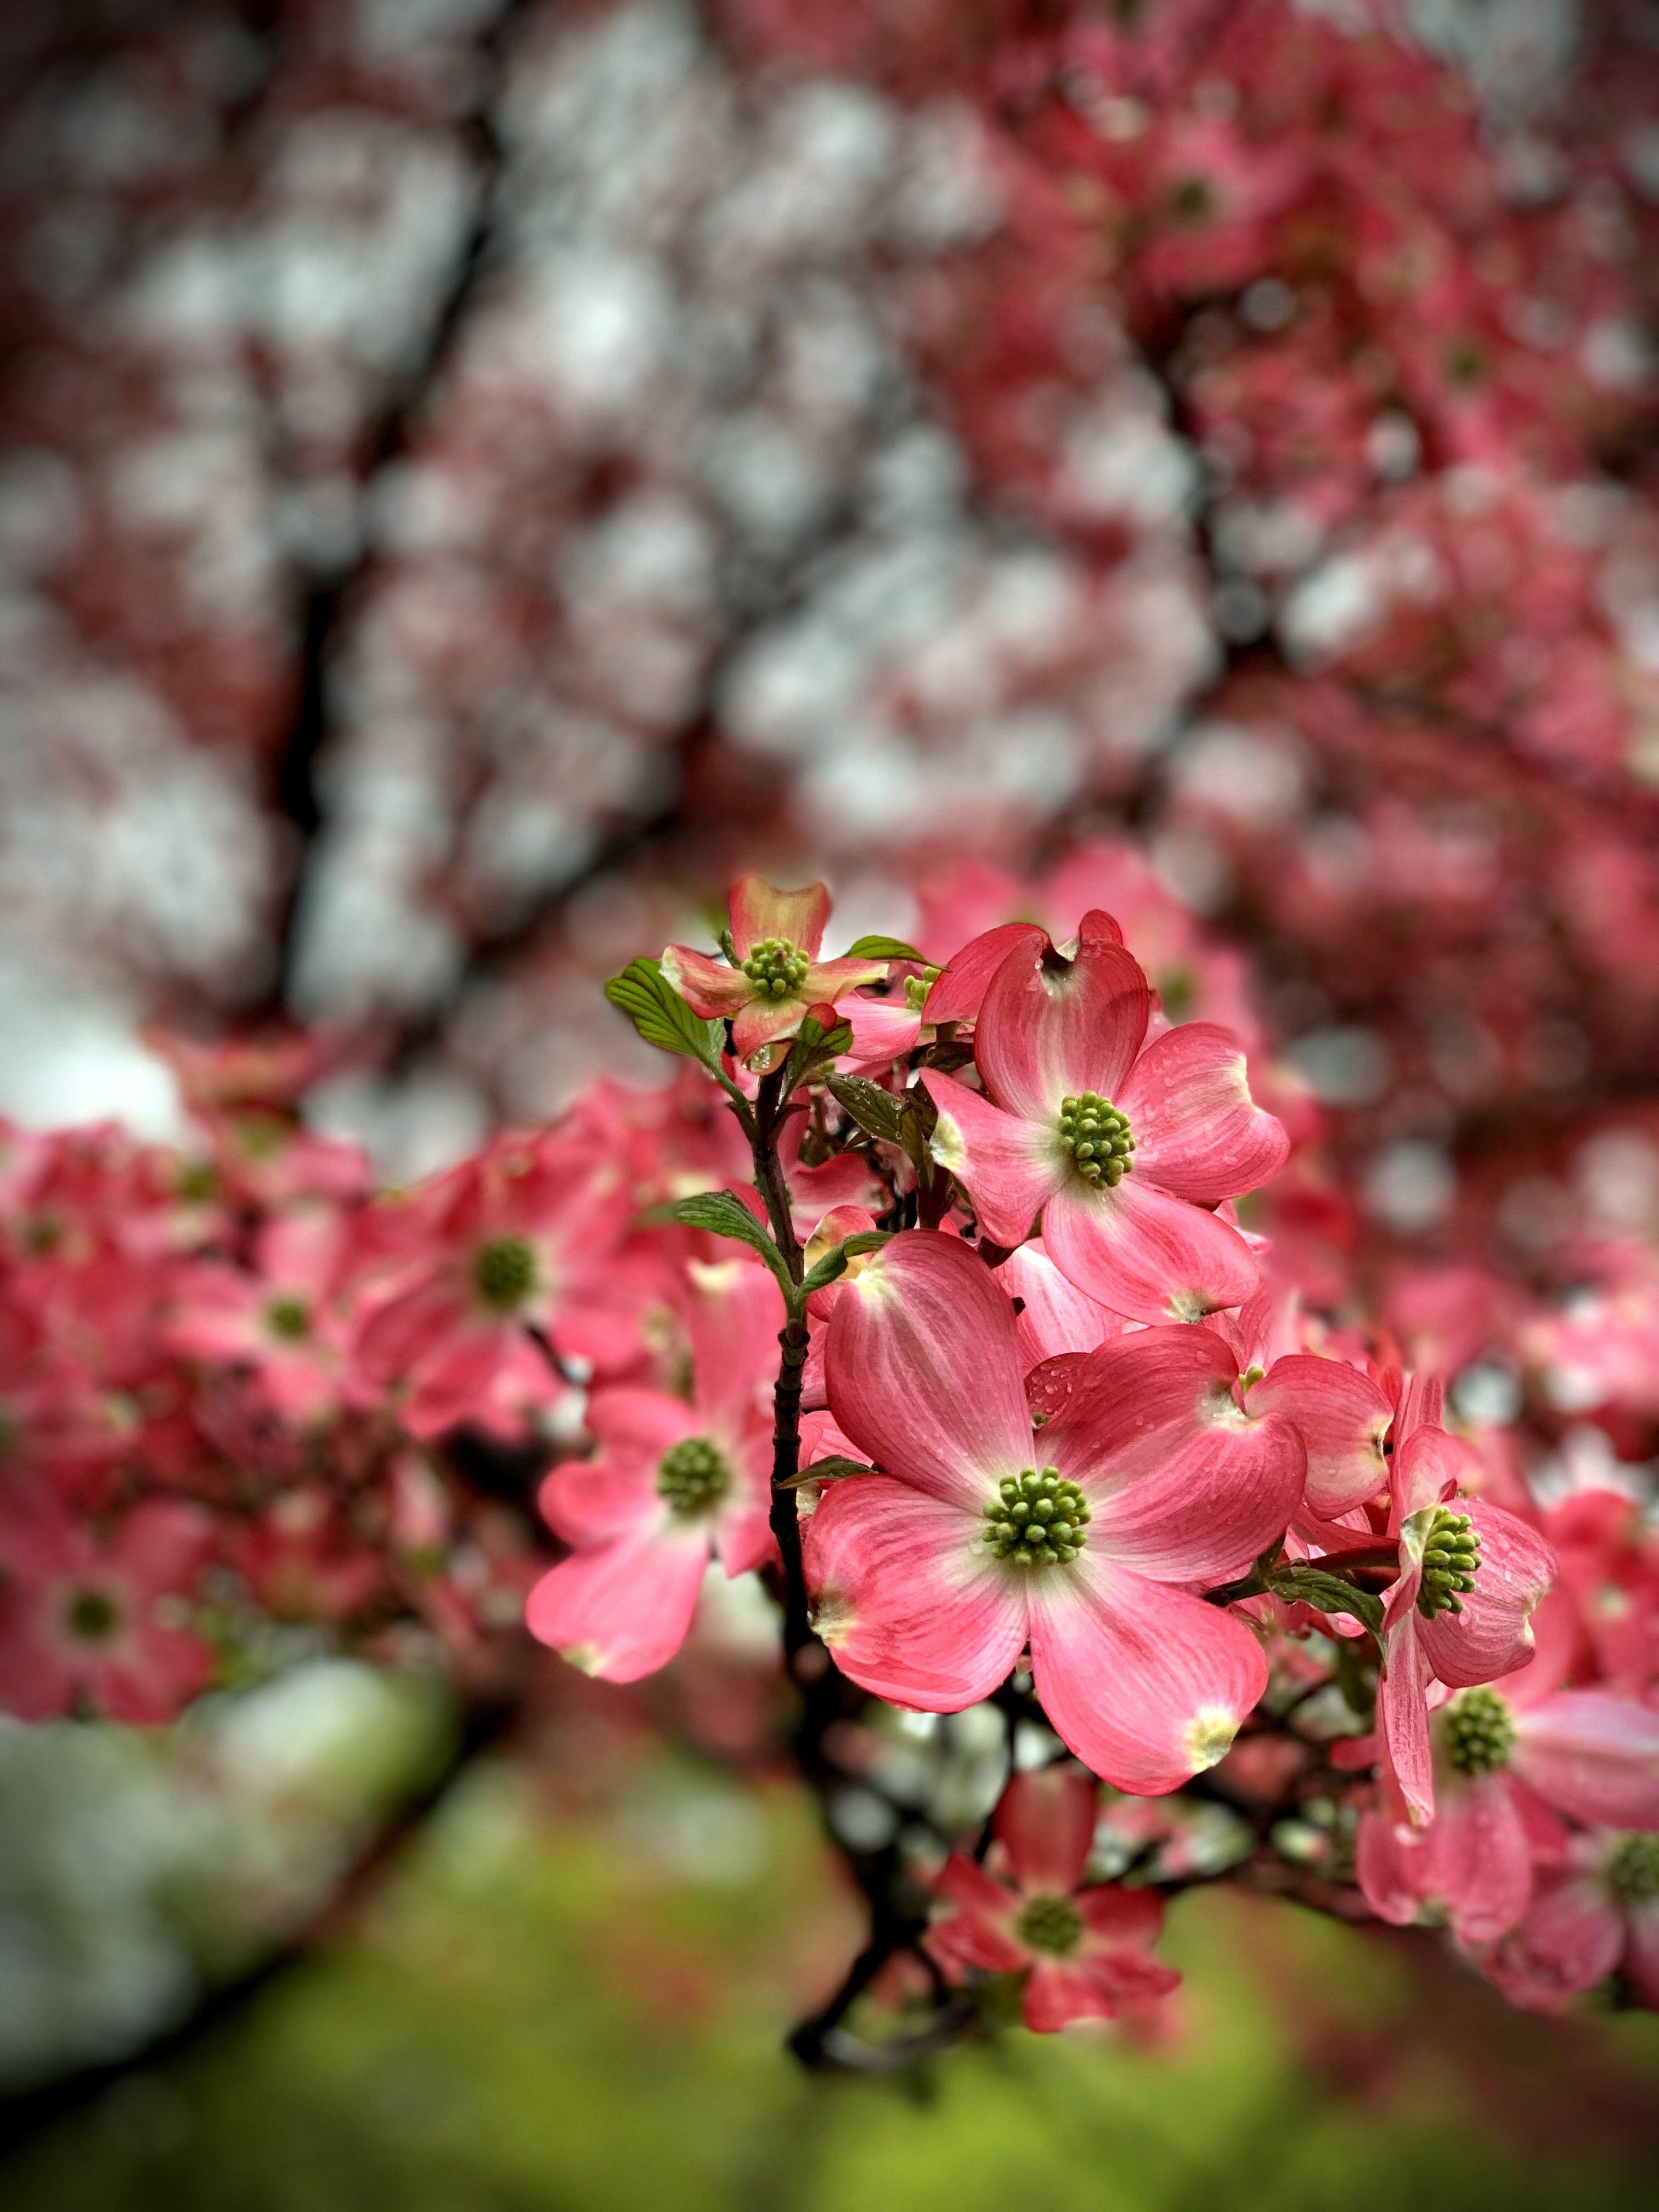 Dogwood Tree Blossoms Flowering Trees Dogwood Trees Blossom